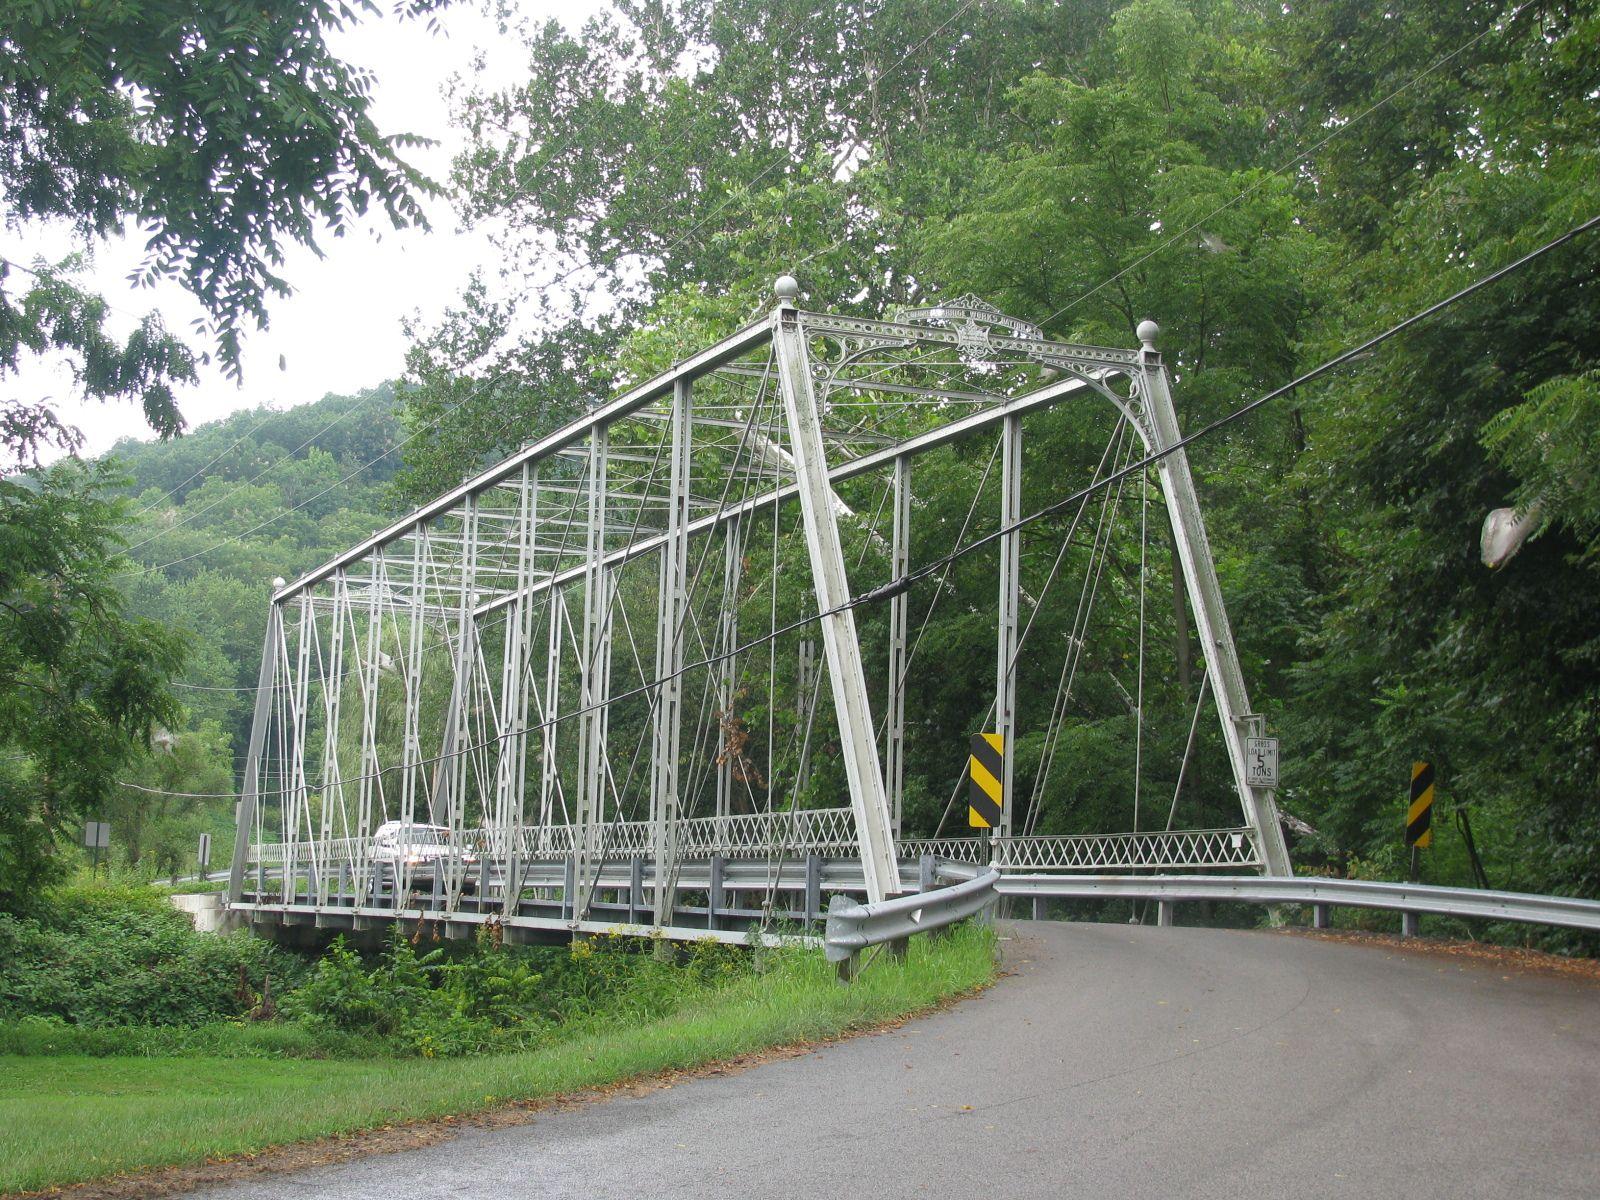 Ohio columbiana county rogers - Negley Bridge Columbiana County Ohio Built 1882 Through Truss Bridge Over North Fork